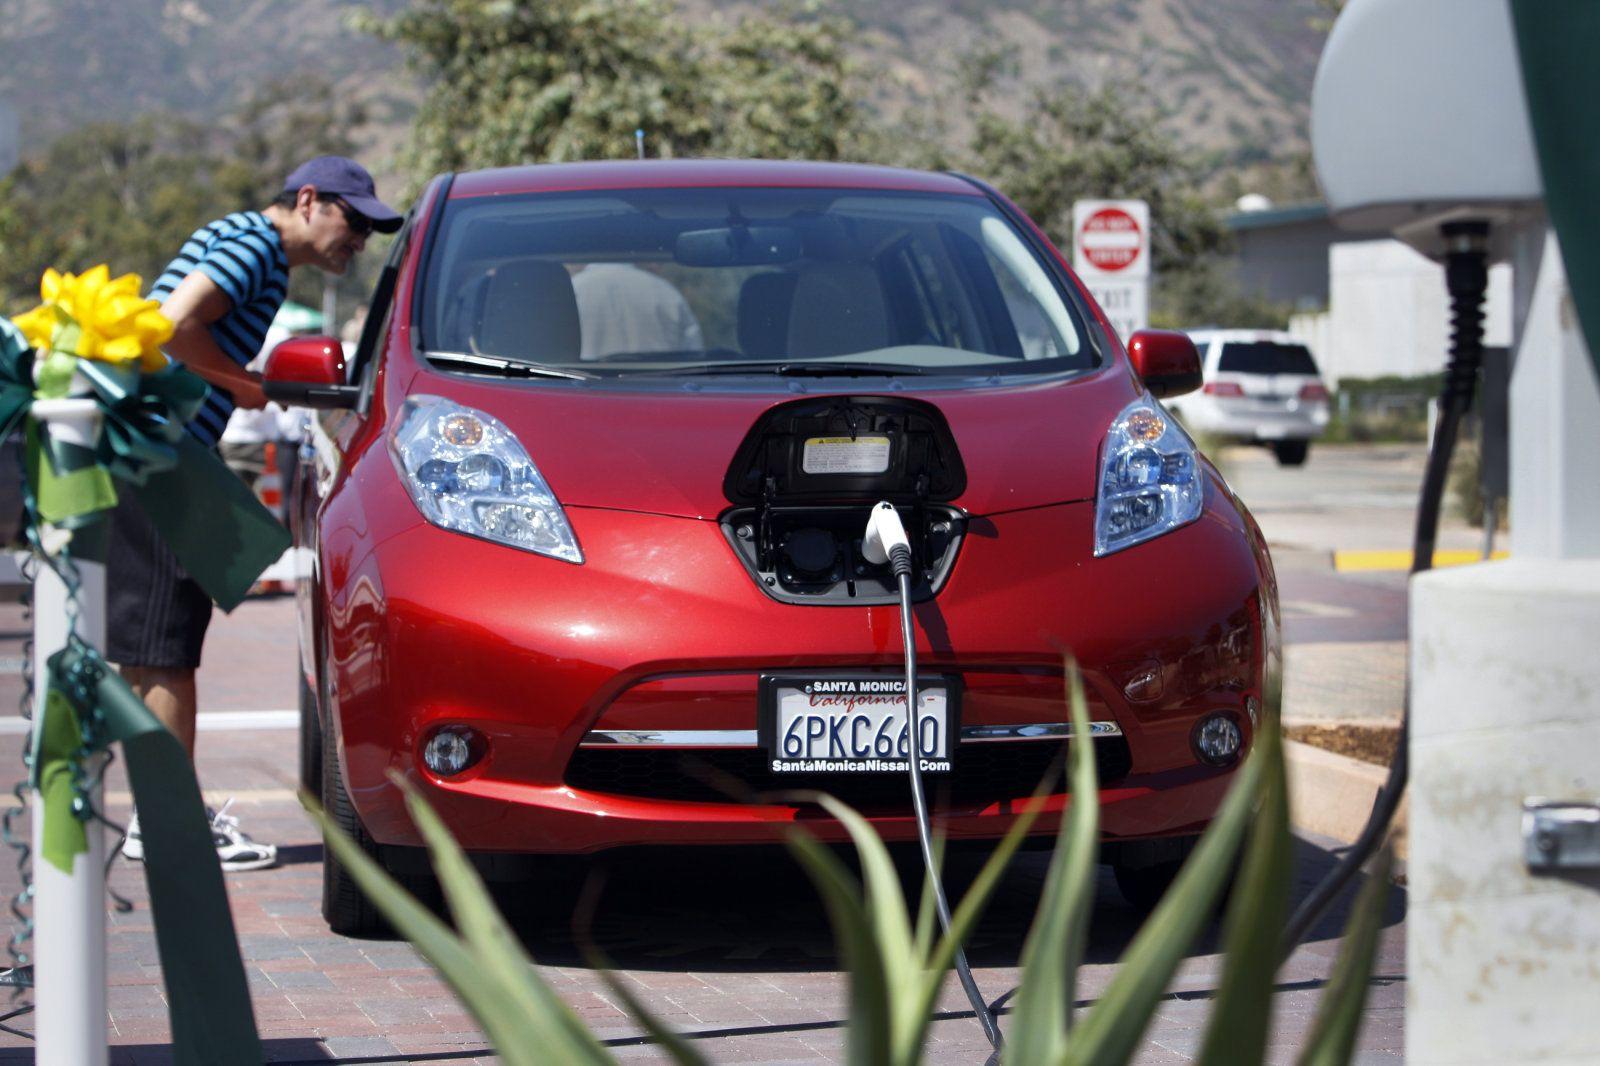 California power companies want 1 billion to build EV